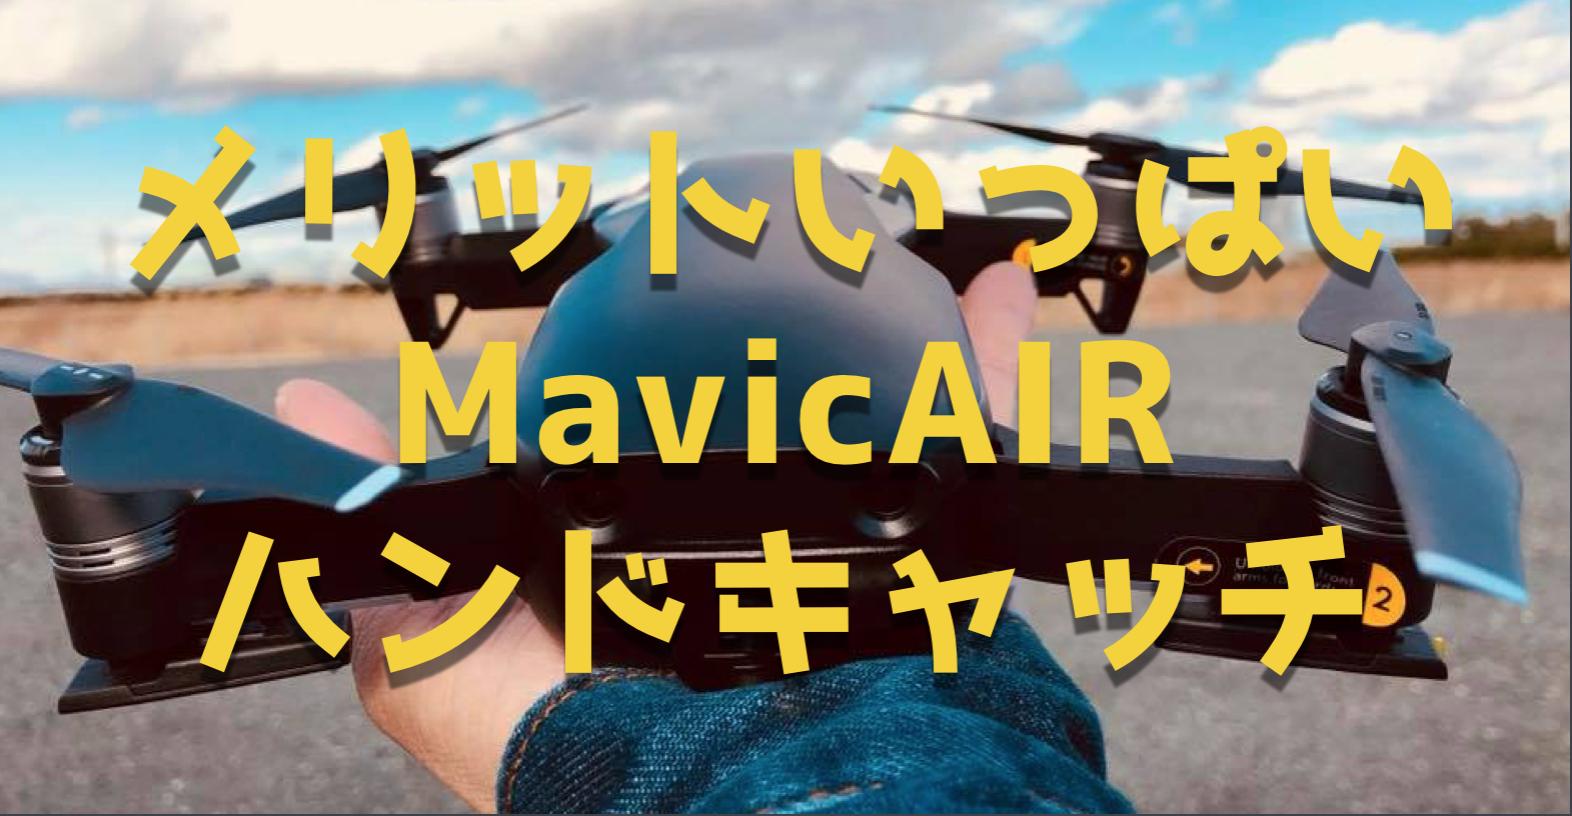 MavicAIR(マビックエア)をハンドキャッチする方法